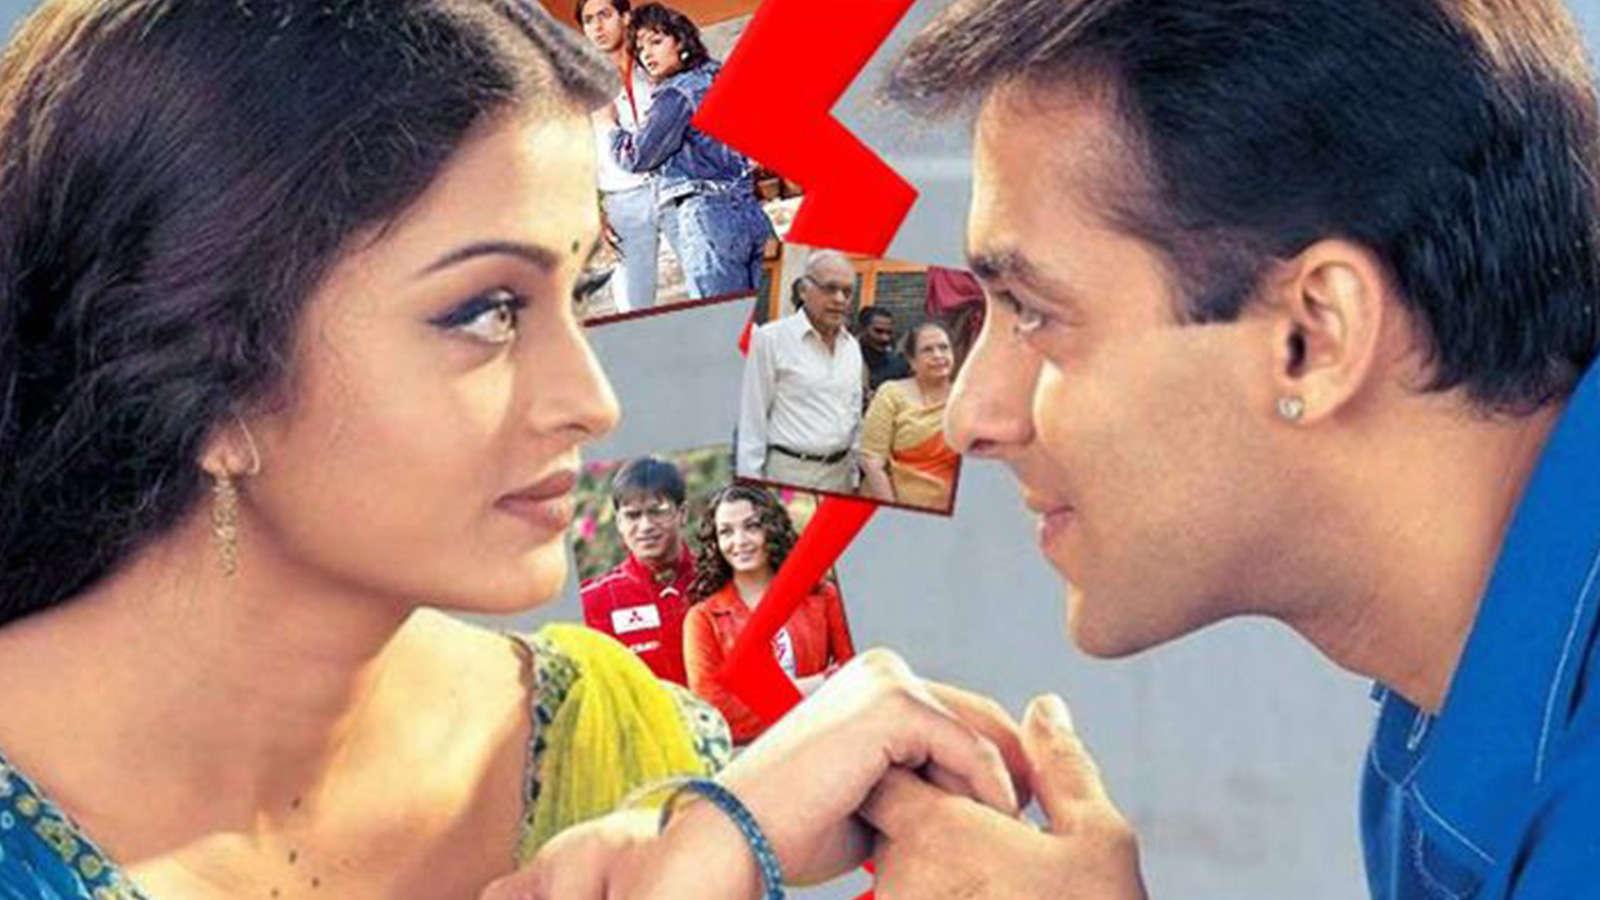 Real Truth Behind Salman Khan And Aishwarya Rai Break Up